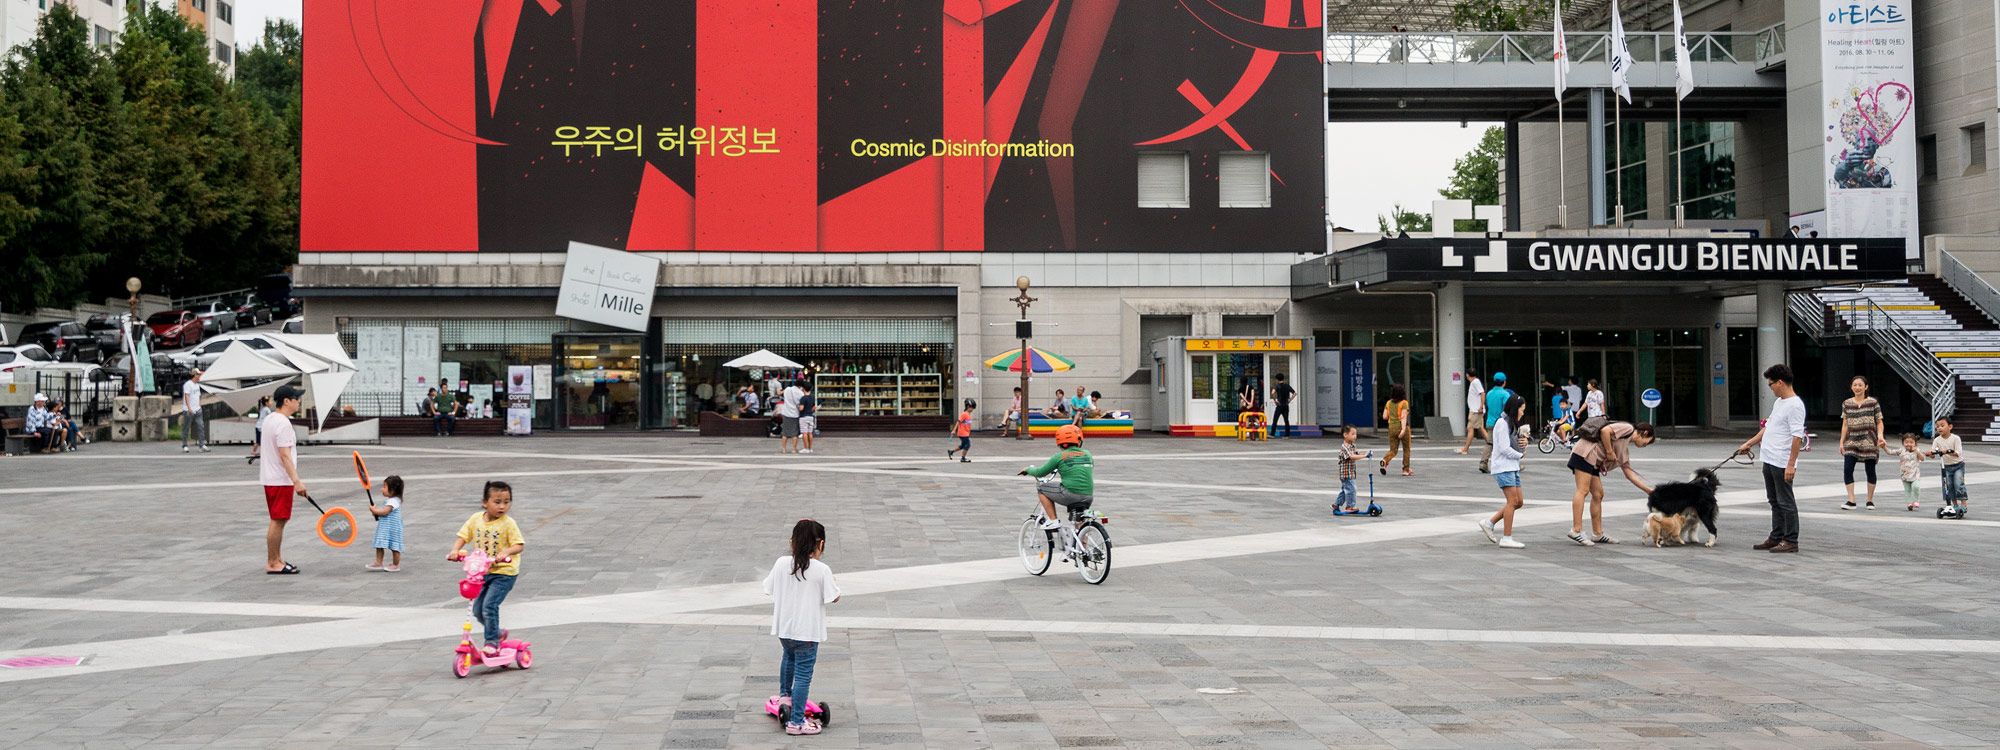 Gwangju Biennale 2016 - Fototour